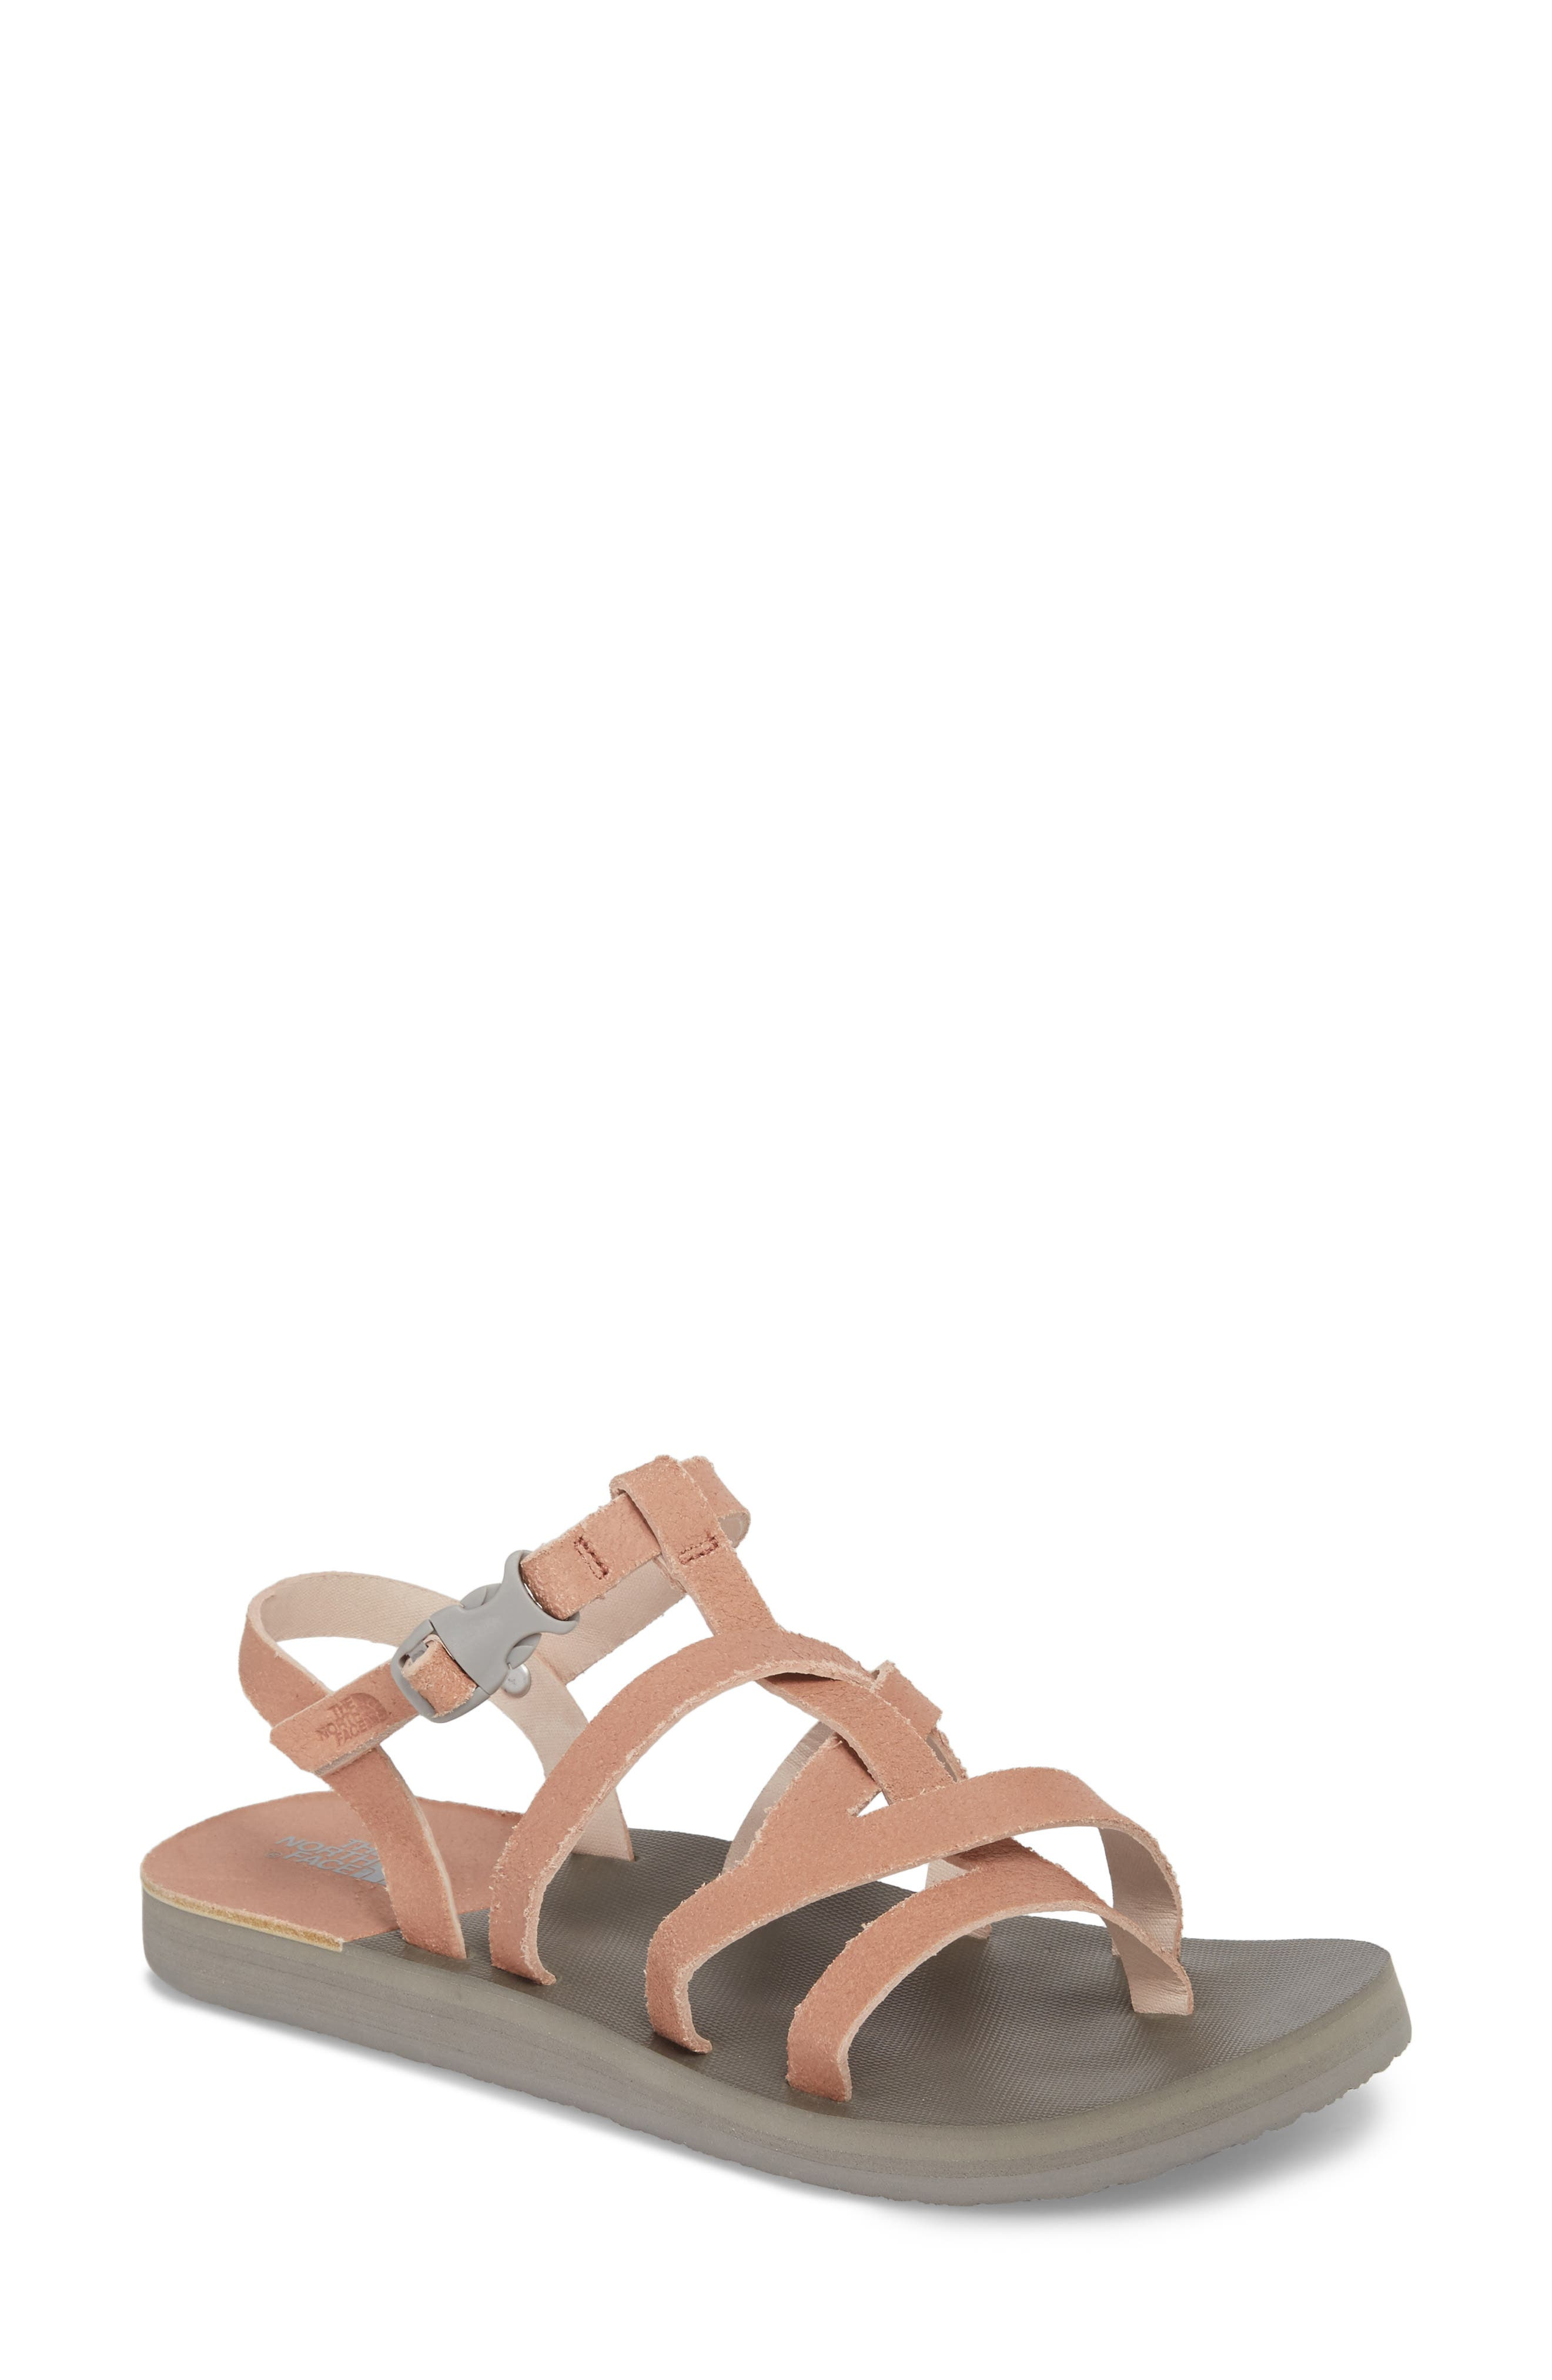 Base Camp Plus II Gladiator Sandal,                             Main thumbnail 1, color,                             Evening Sand Pink/ Foil Grey